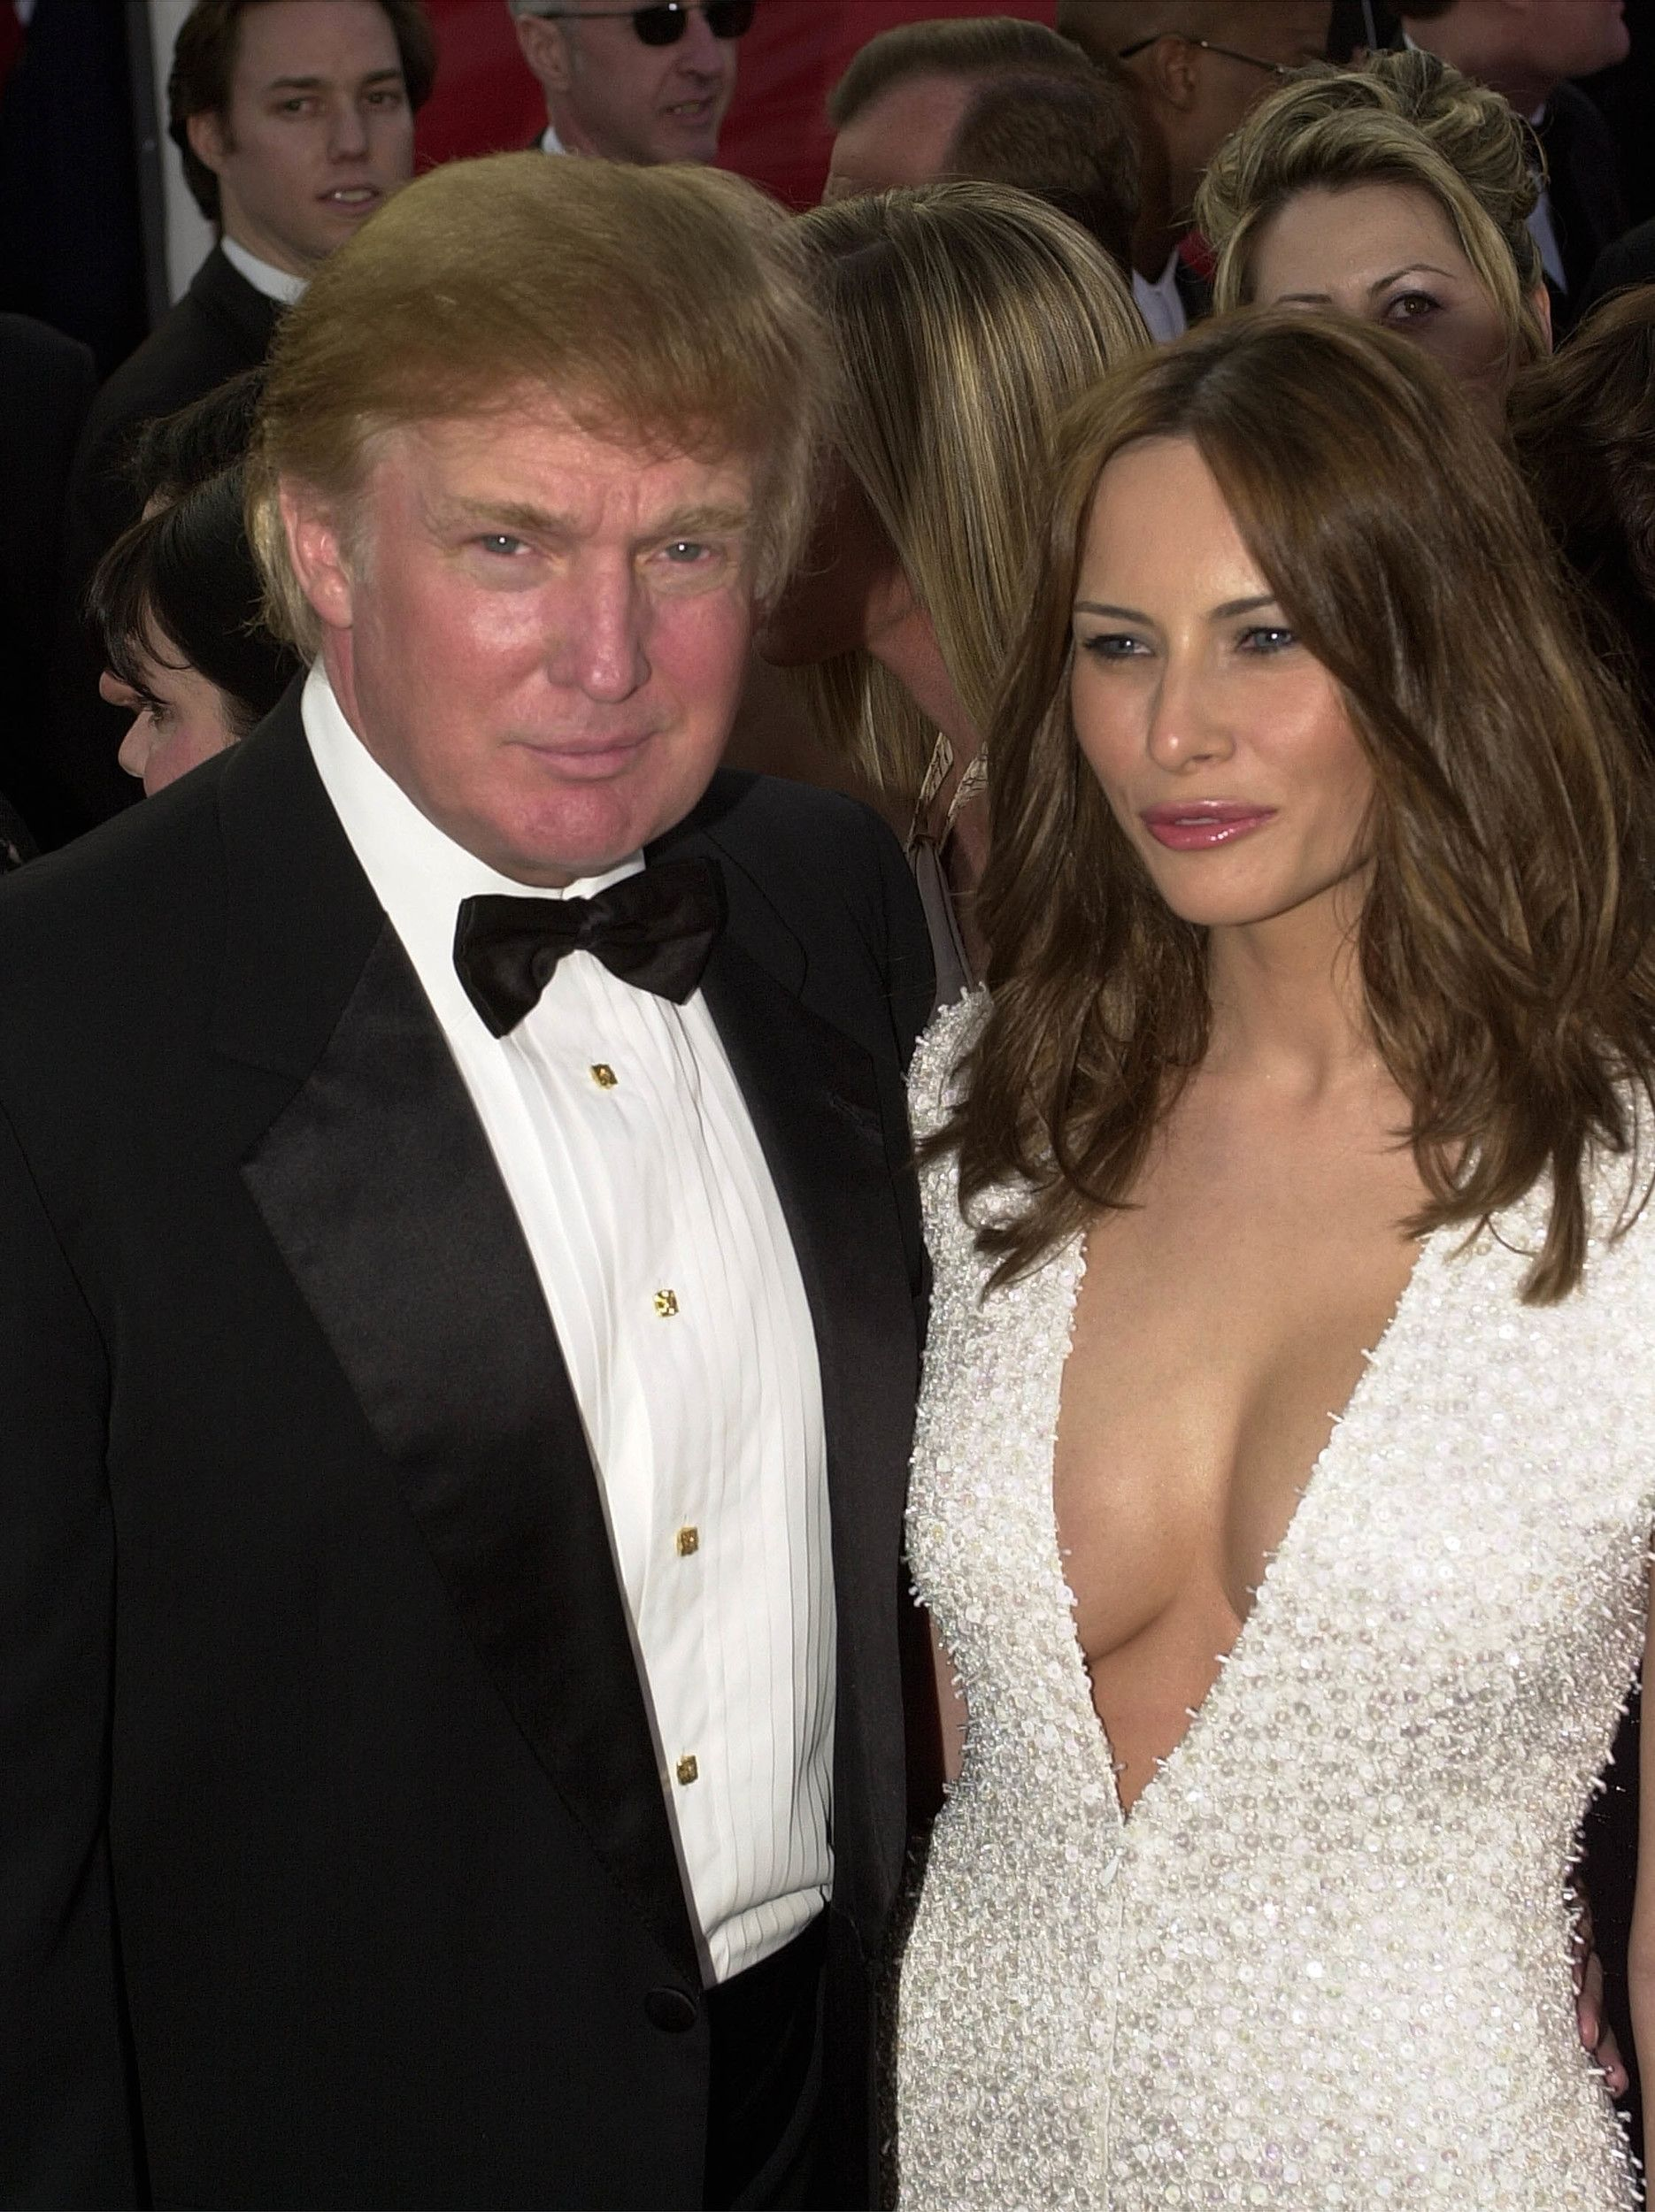 Old Nude Photos Put Melania Trump Under Spotlight She Didn